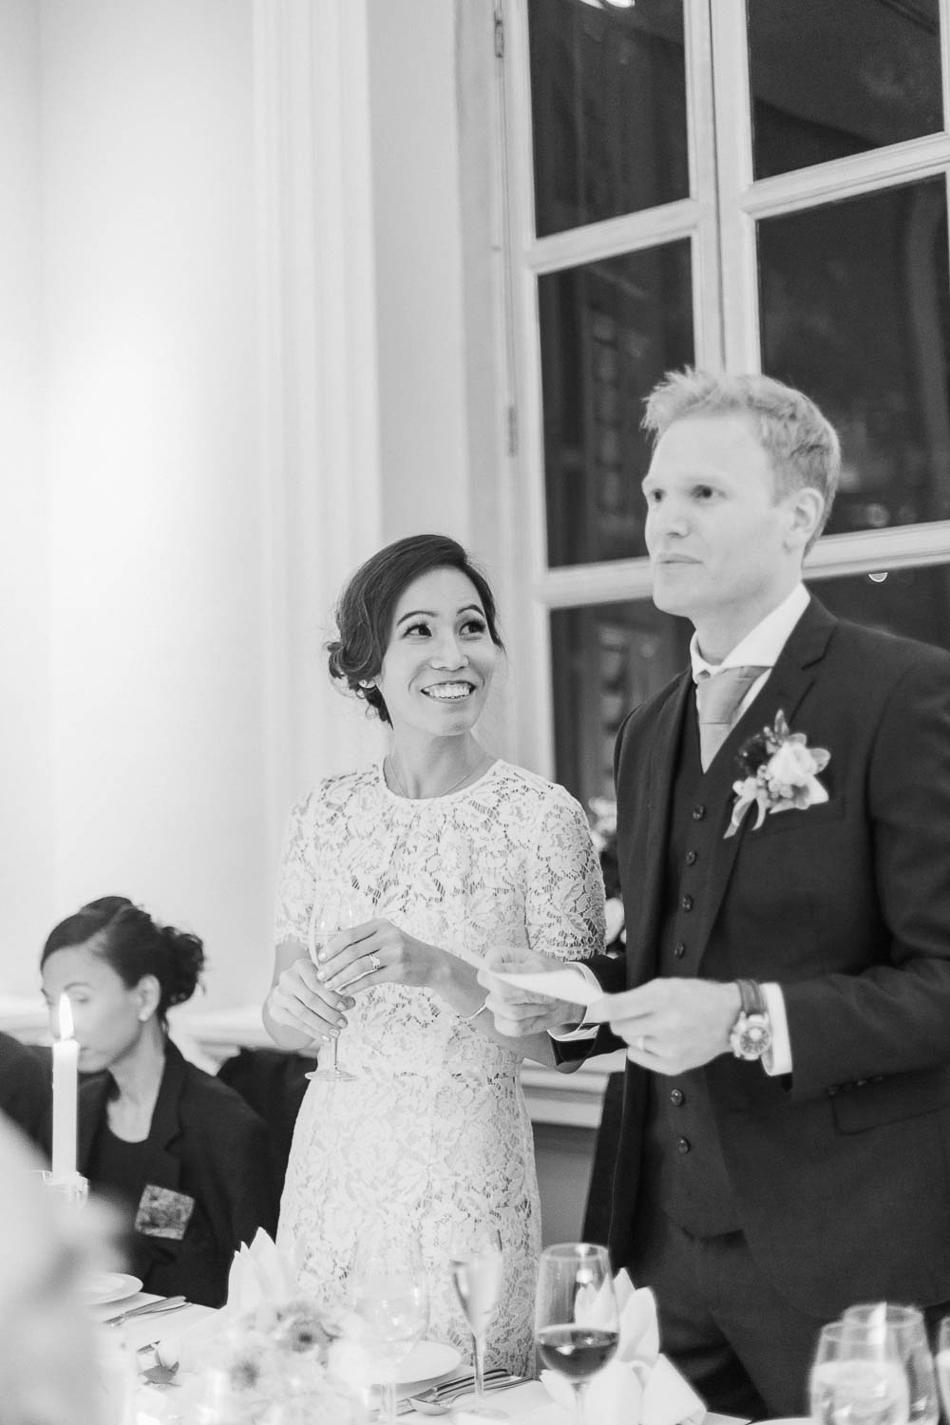 wedding-photographer-singapore-film-photographer-chen-sands-Anglea-wedding-CSPBLOG-21.jpg